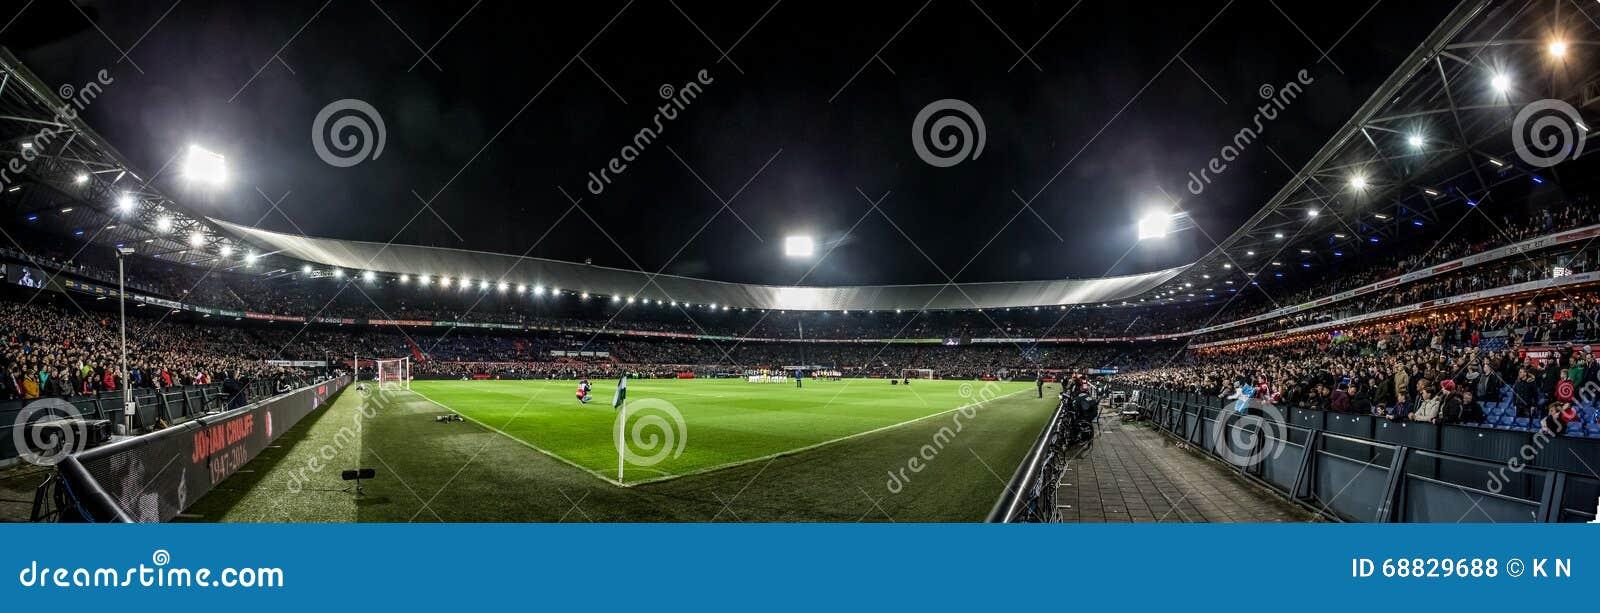 Panorama overview de Kuip at Evening match